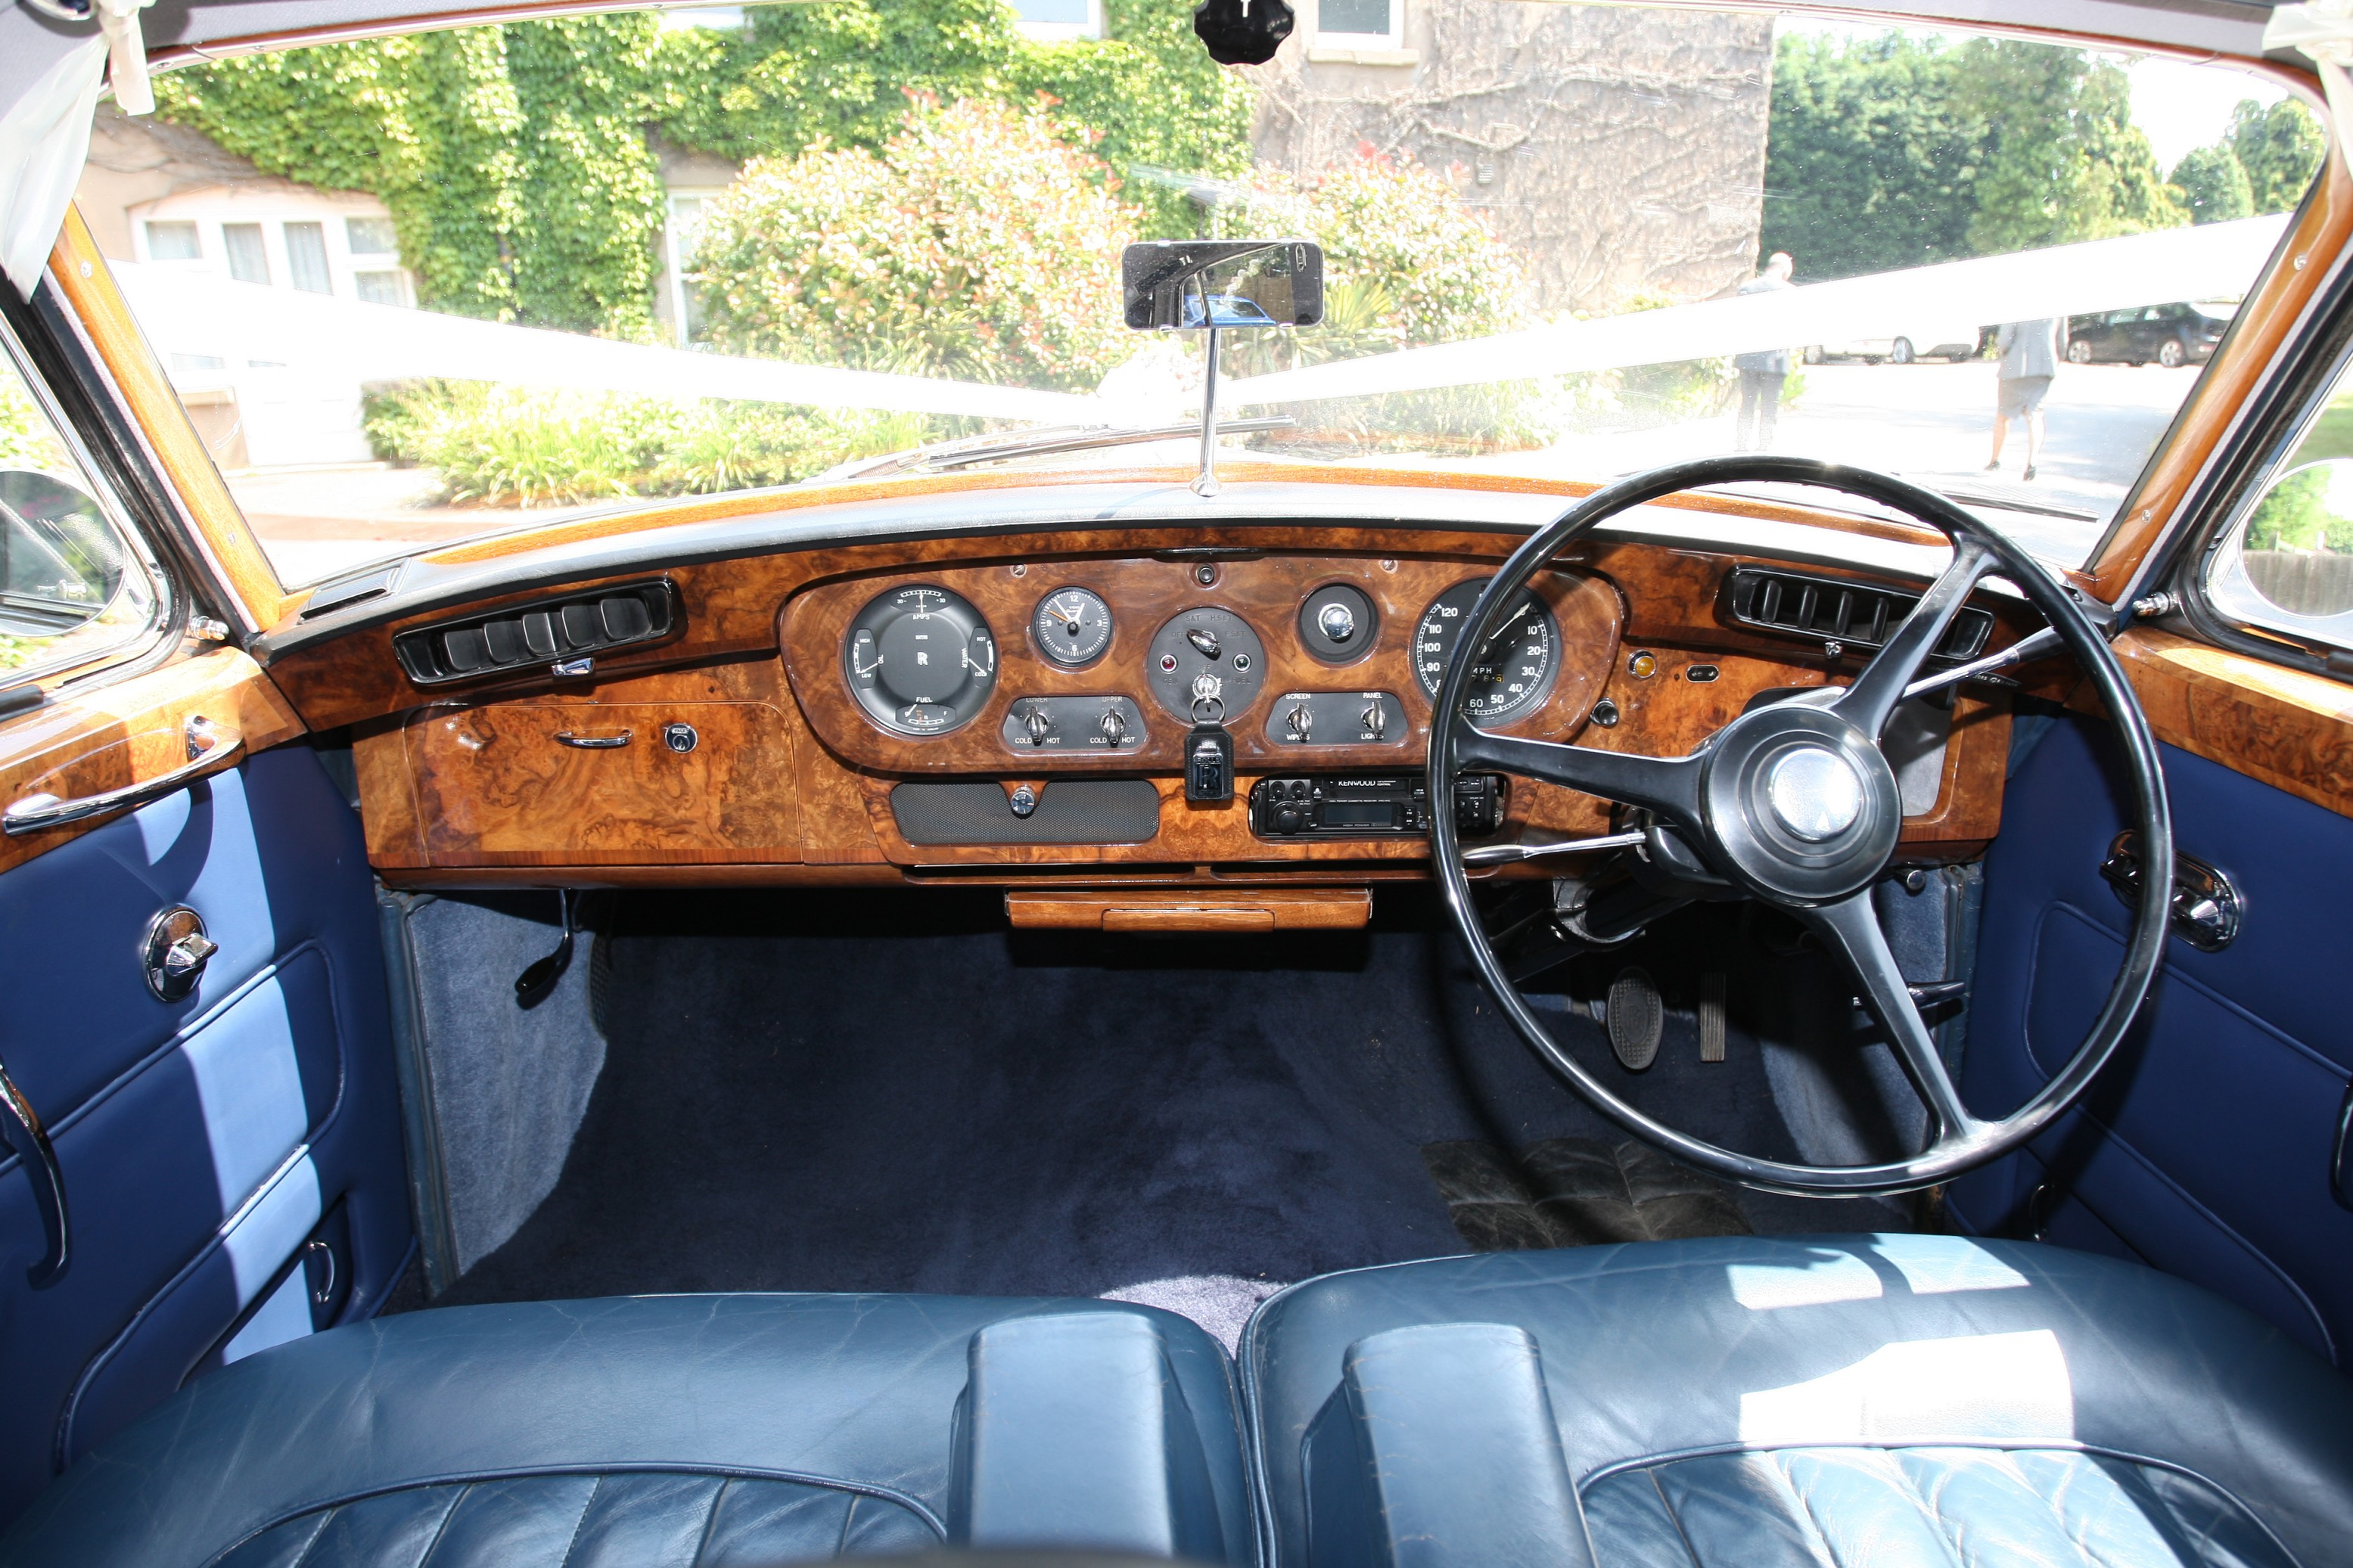 Gallery - Worcestershire Wedding Car Hire